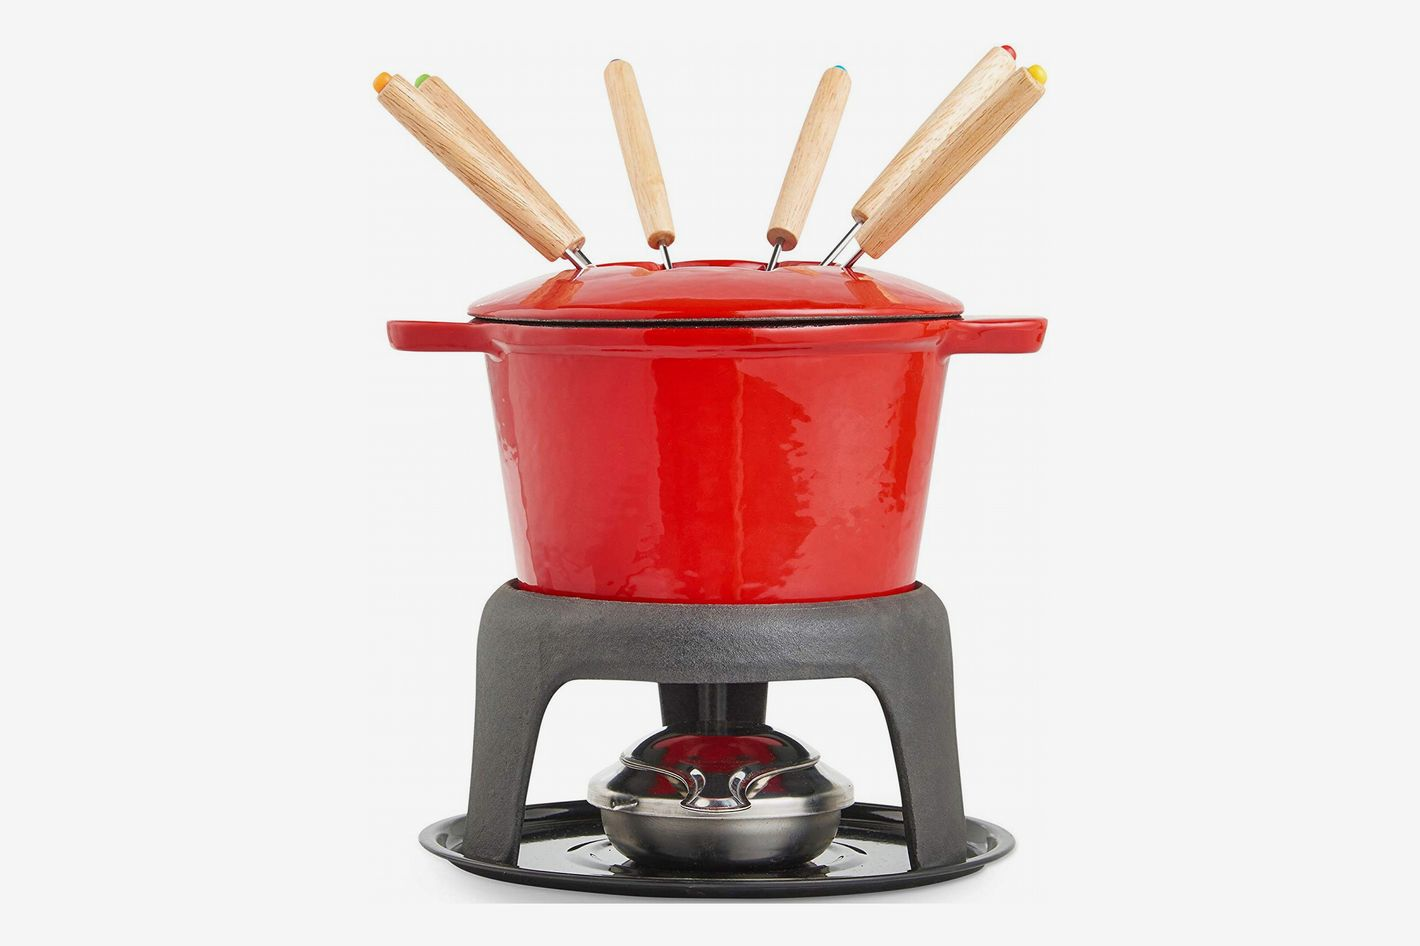 VonShef Cast Iron Porcelain Enamel Fondue Pot Set With 6 Fondue Forks, 1.6-Quart Capacity, Red, 12-Pc. Set